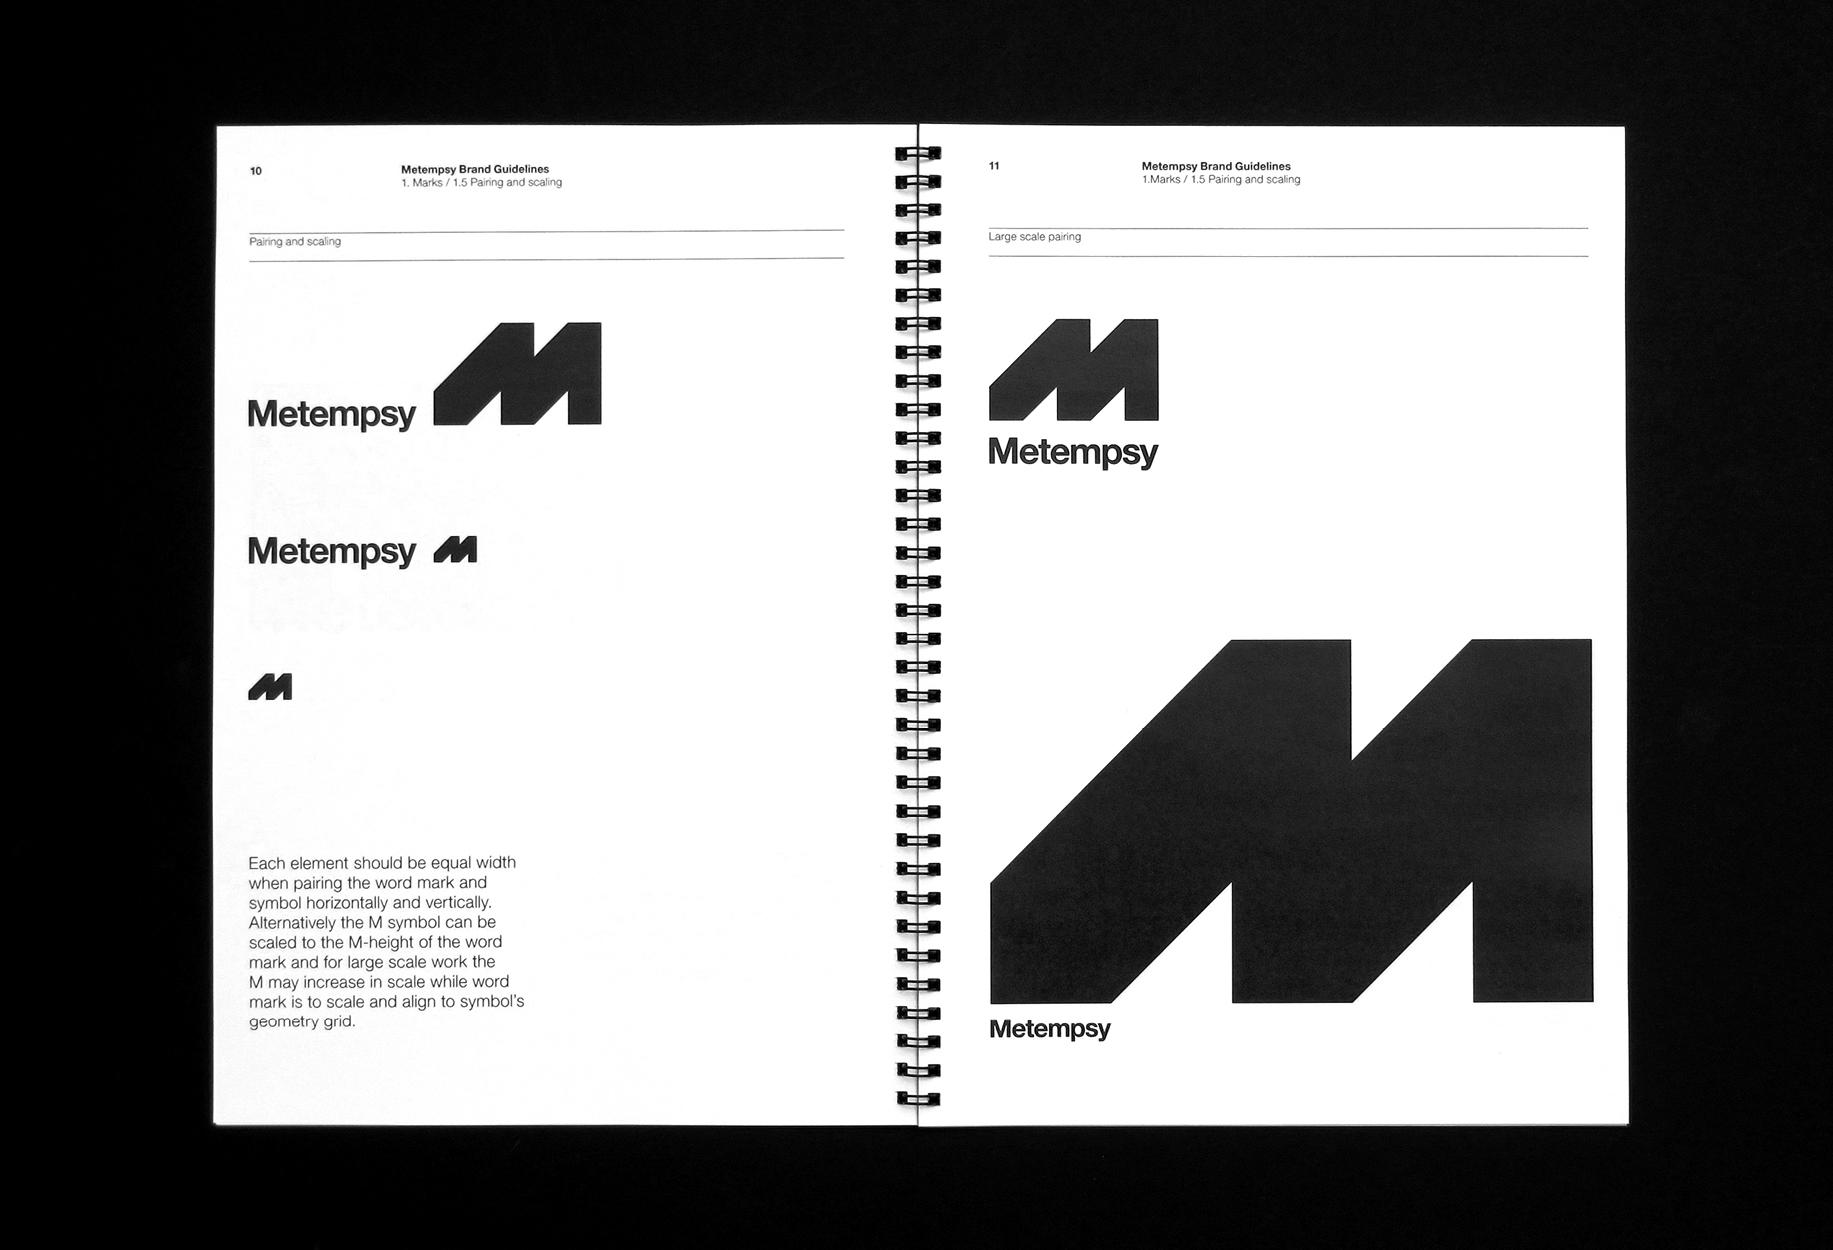 Metempsy-Graphic-Design-Standards-Manual-6.jpg